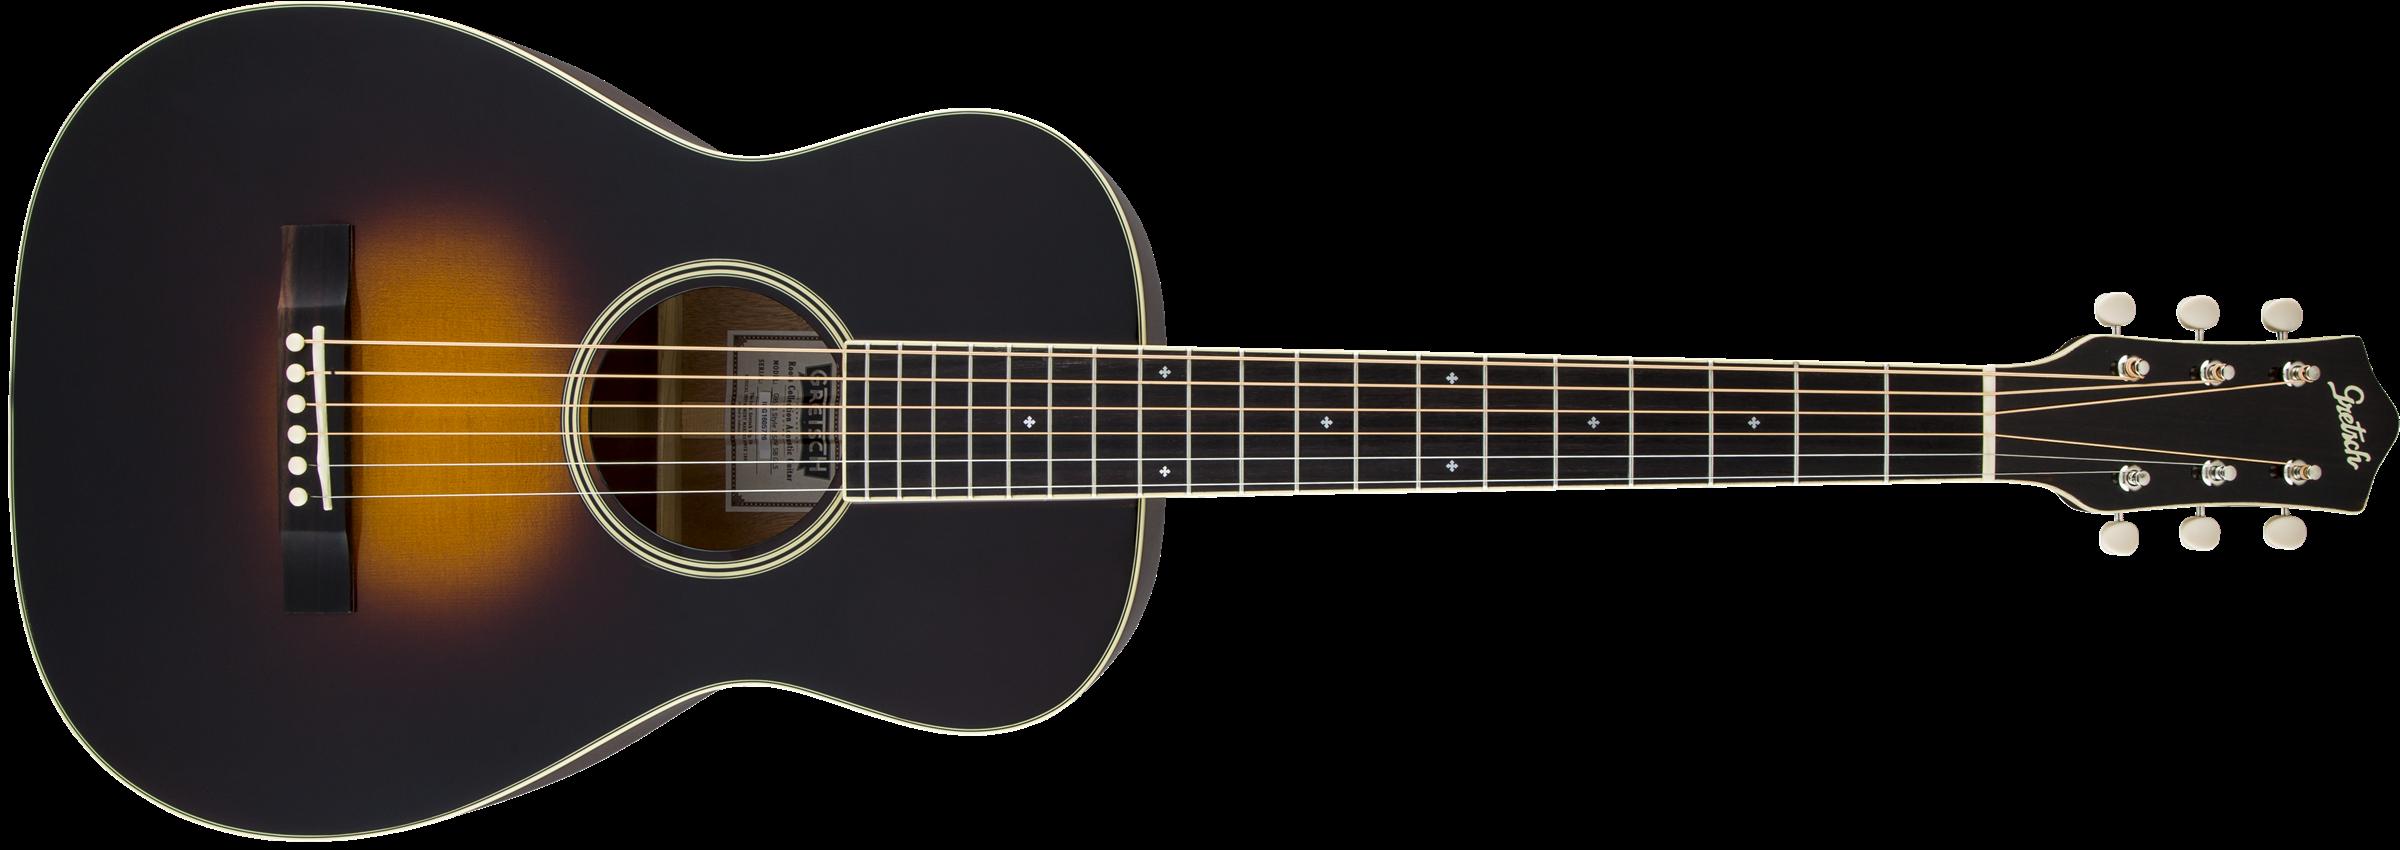 GRETSCH G9511 Style 1 Single-0 Parlor Acoustic Guitar, Appalachia Cloudburst